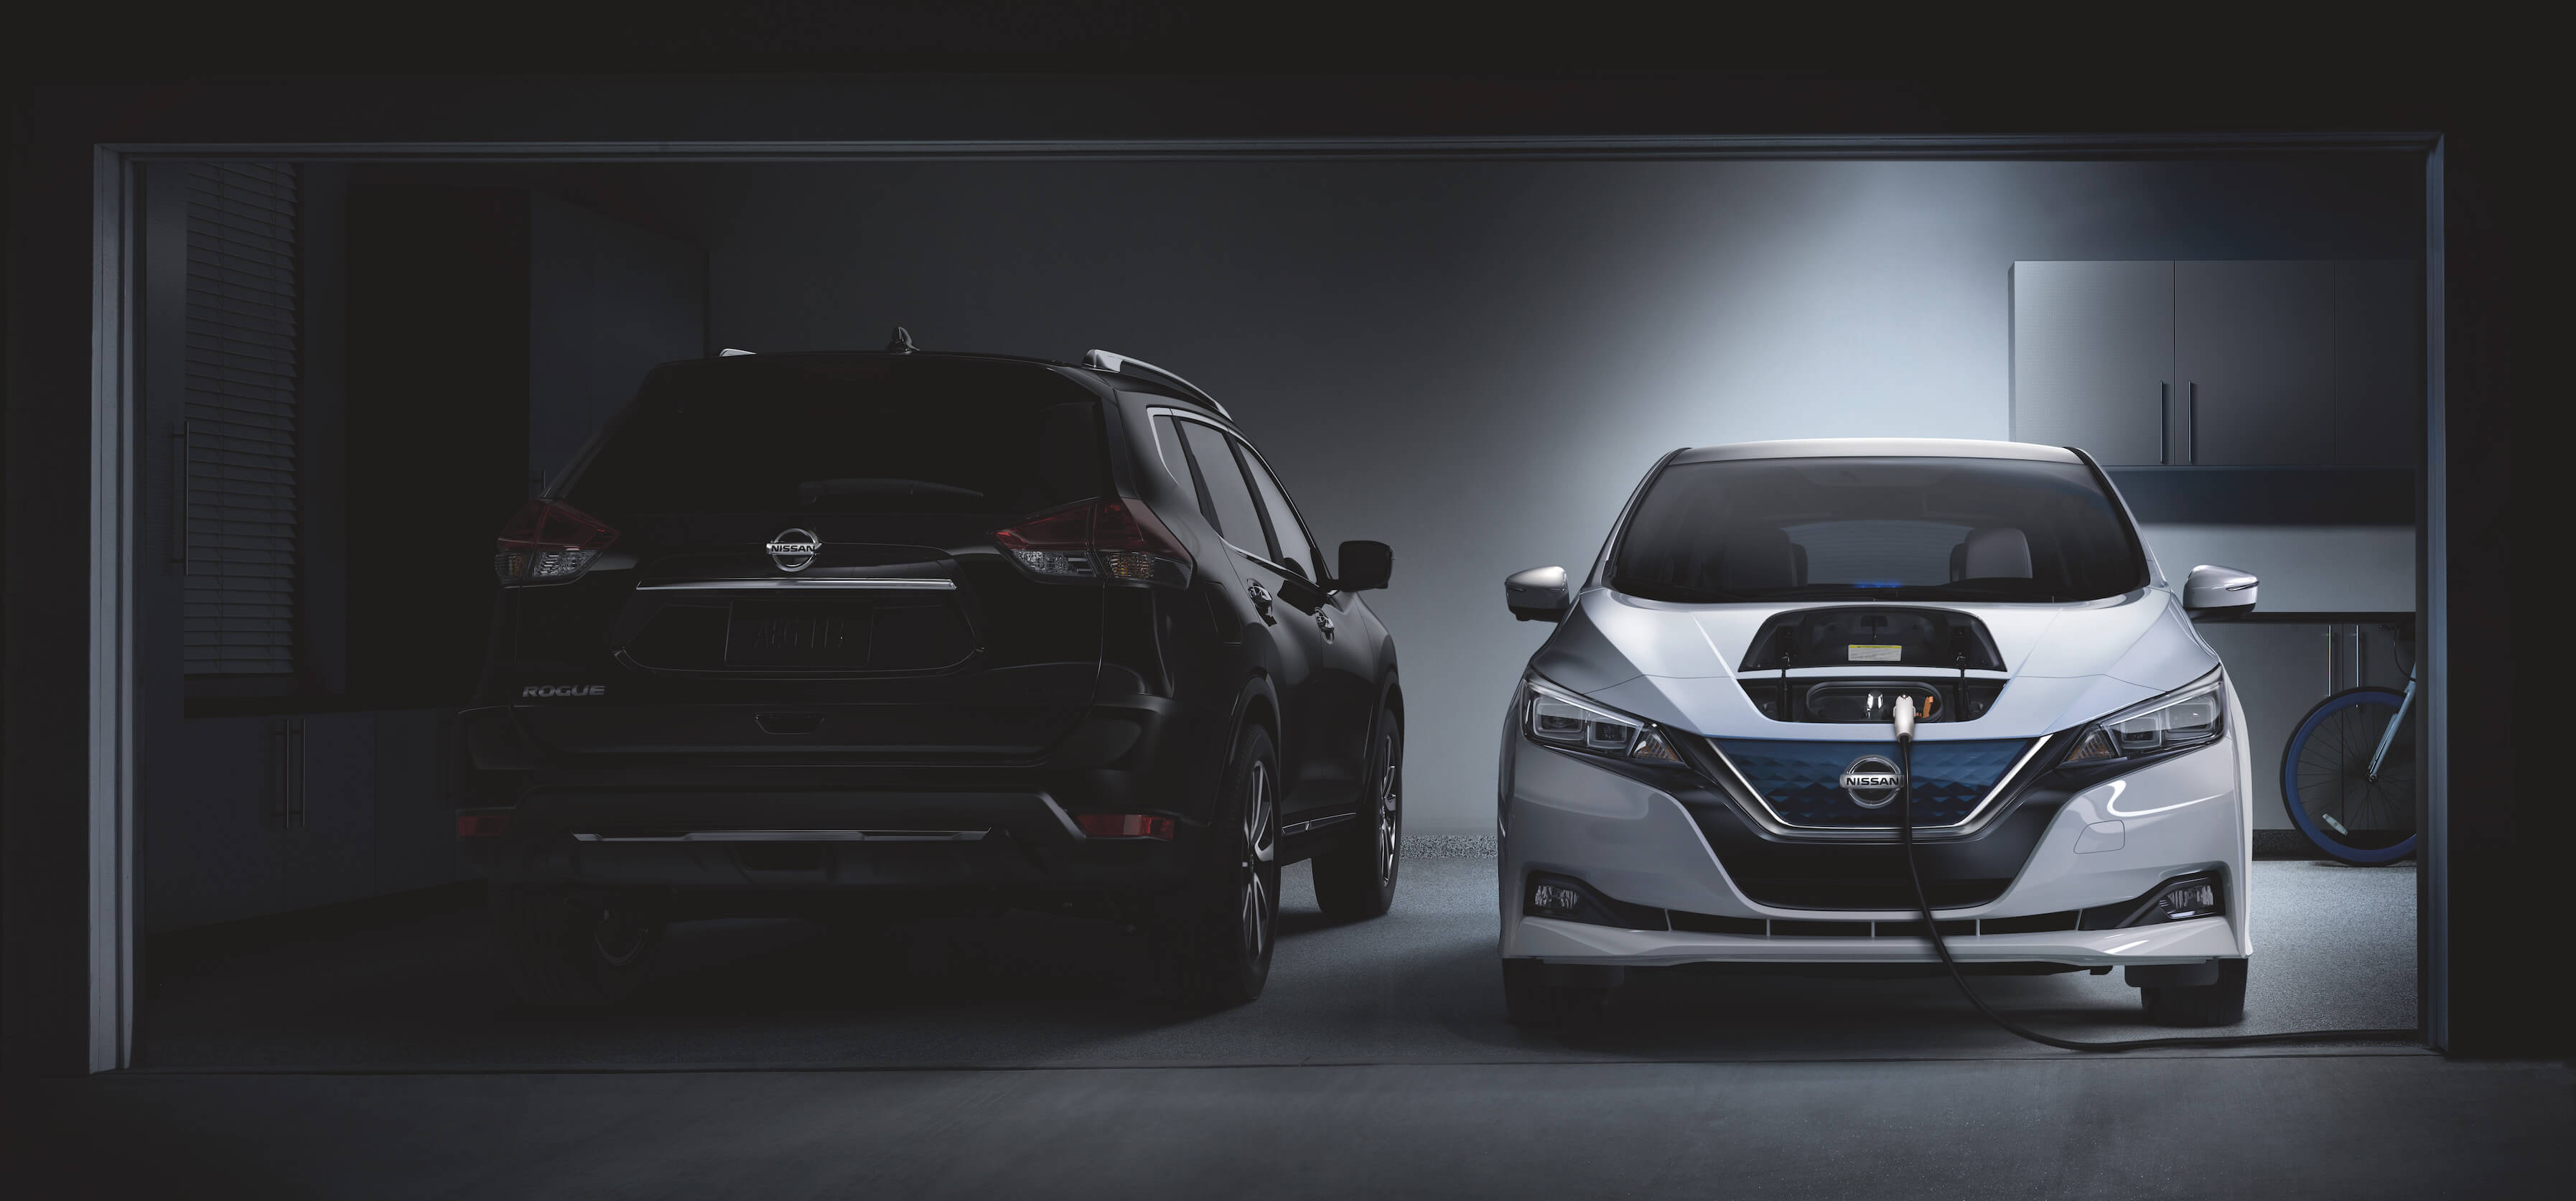 Carson Nissan NissanLeaf Plus